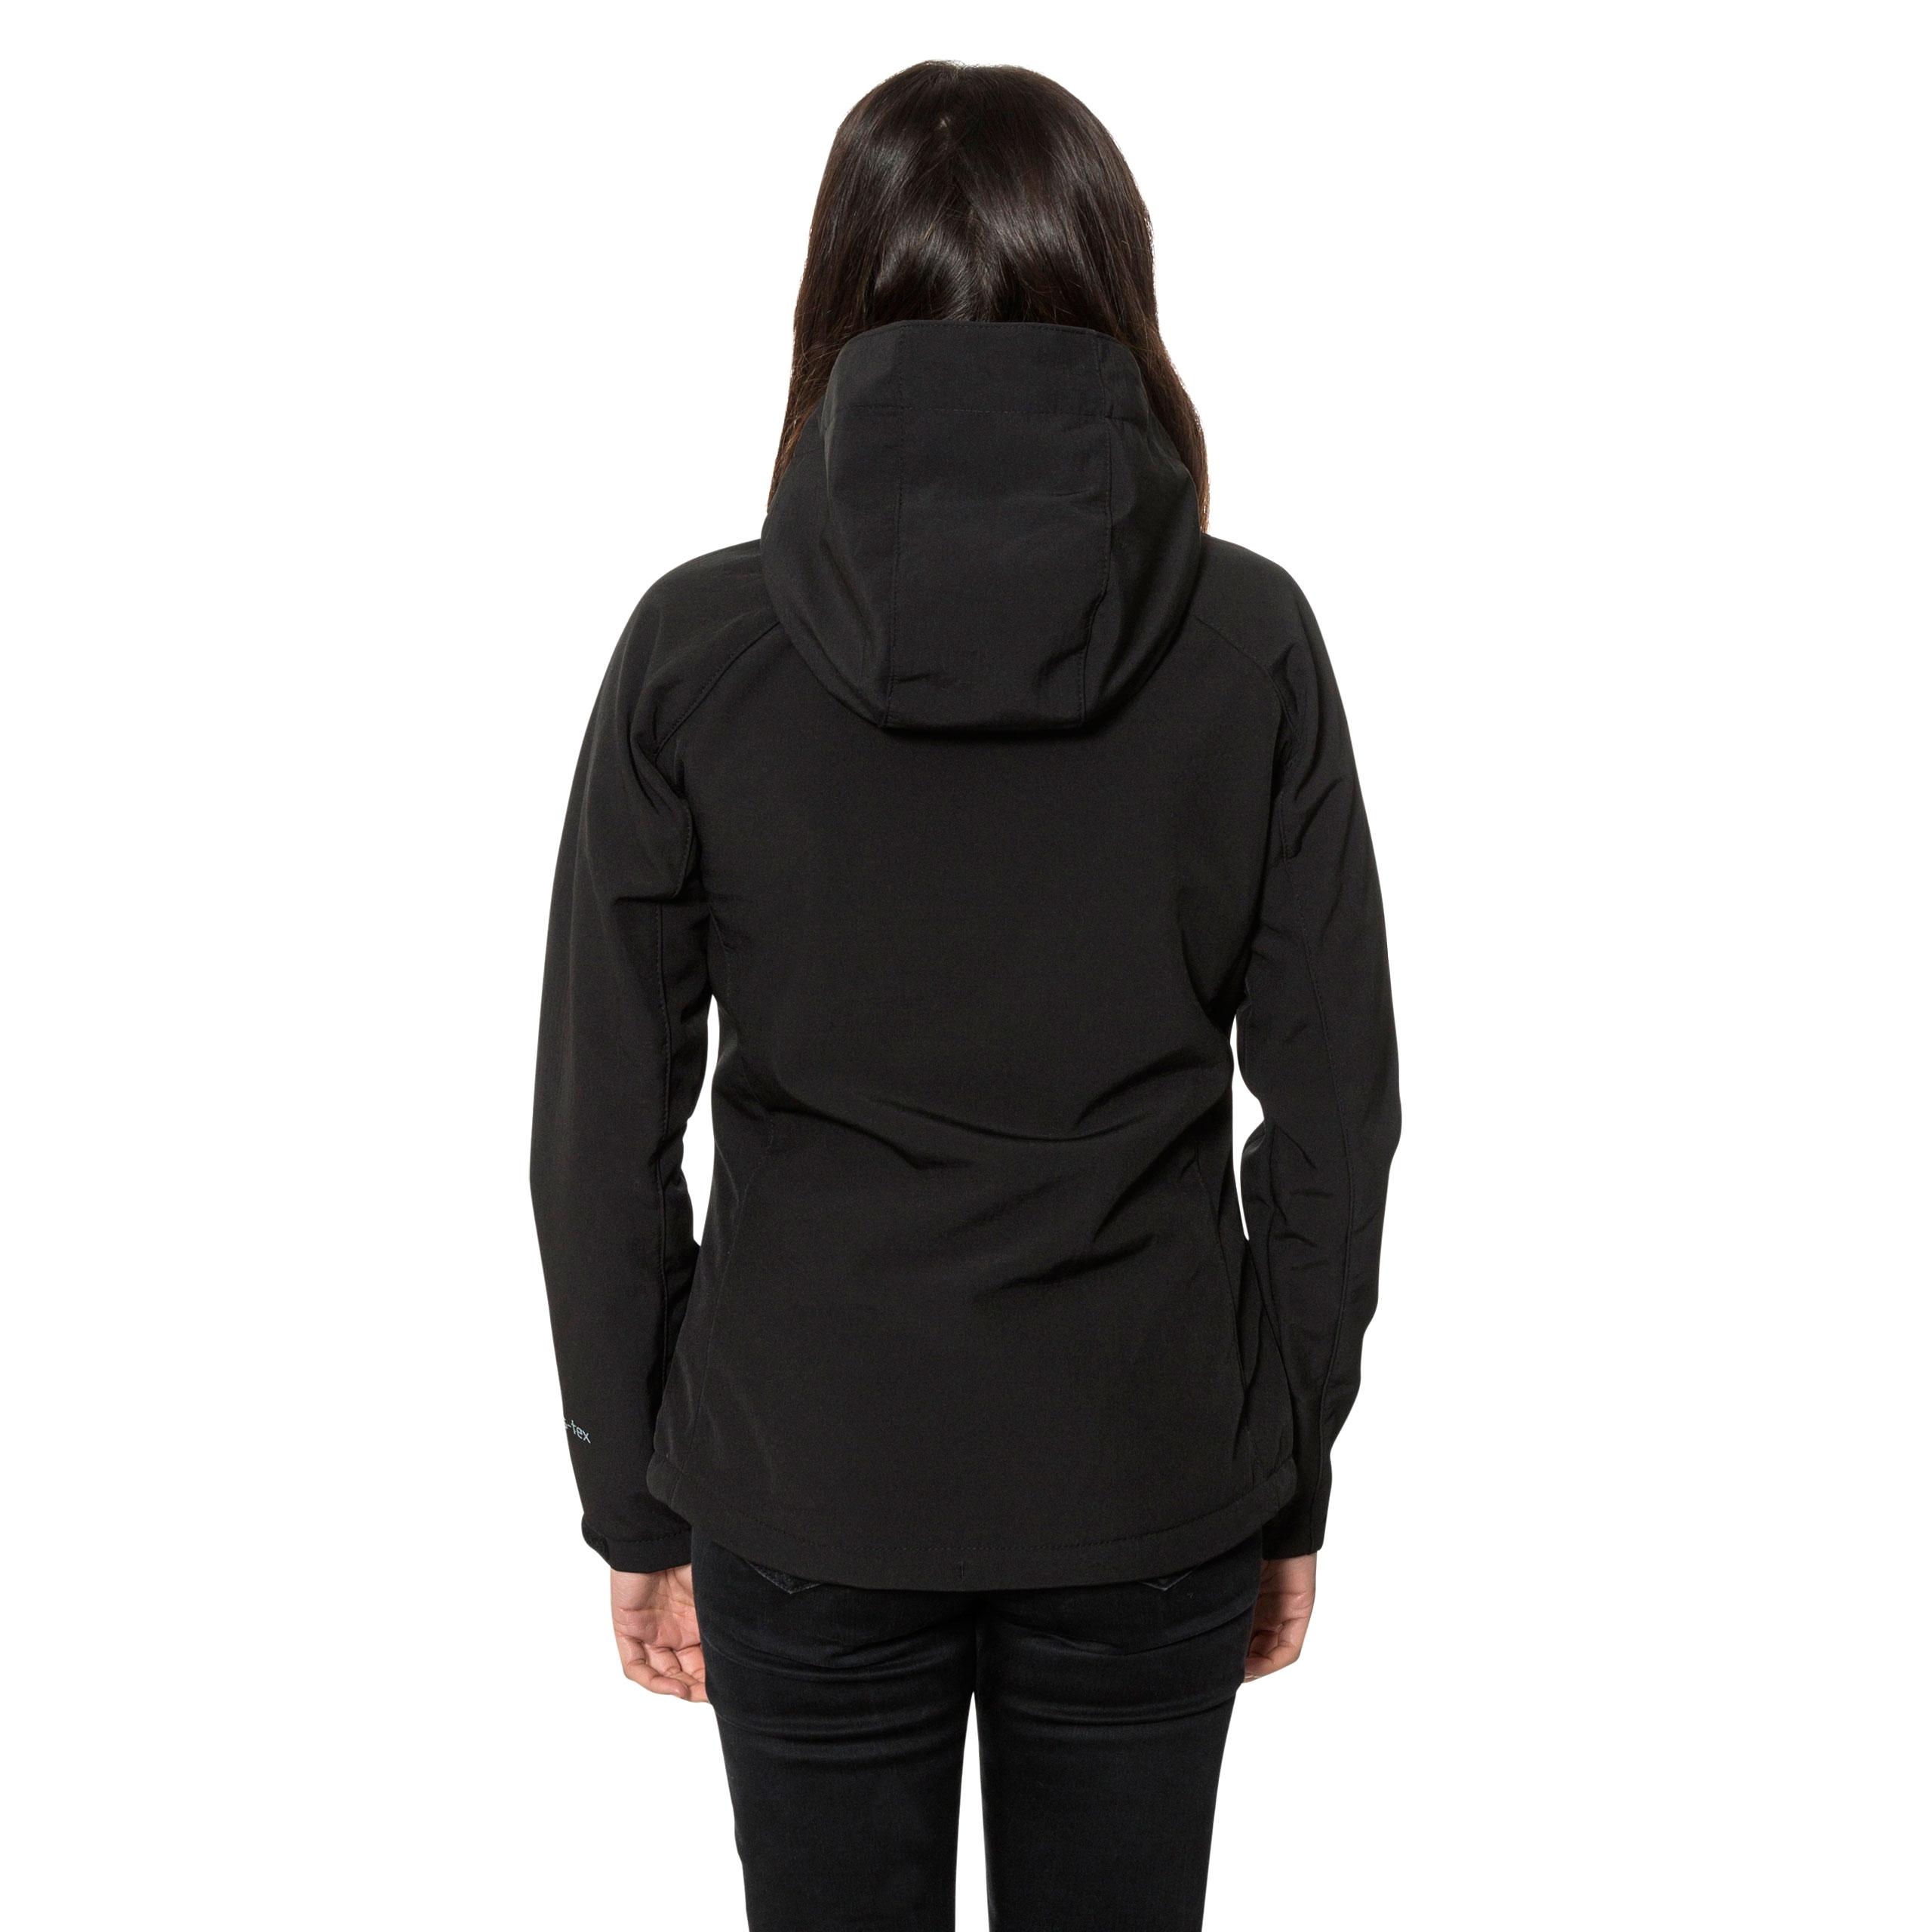 Trespass-Bela-Womens-Soft-Shell-Jacket-Breathable-in-Black-amp-Purple thumbnail 16